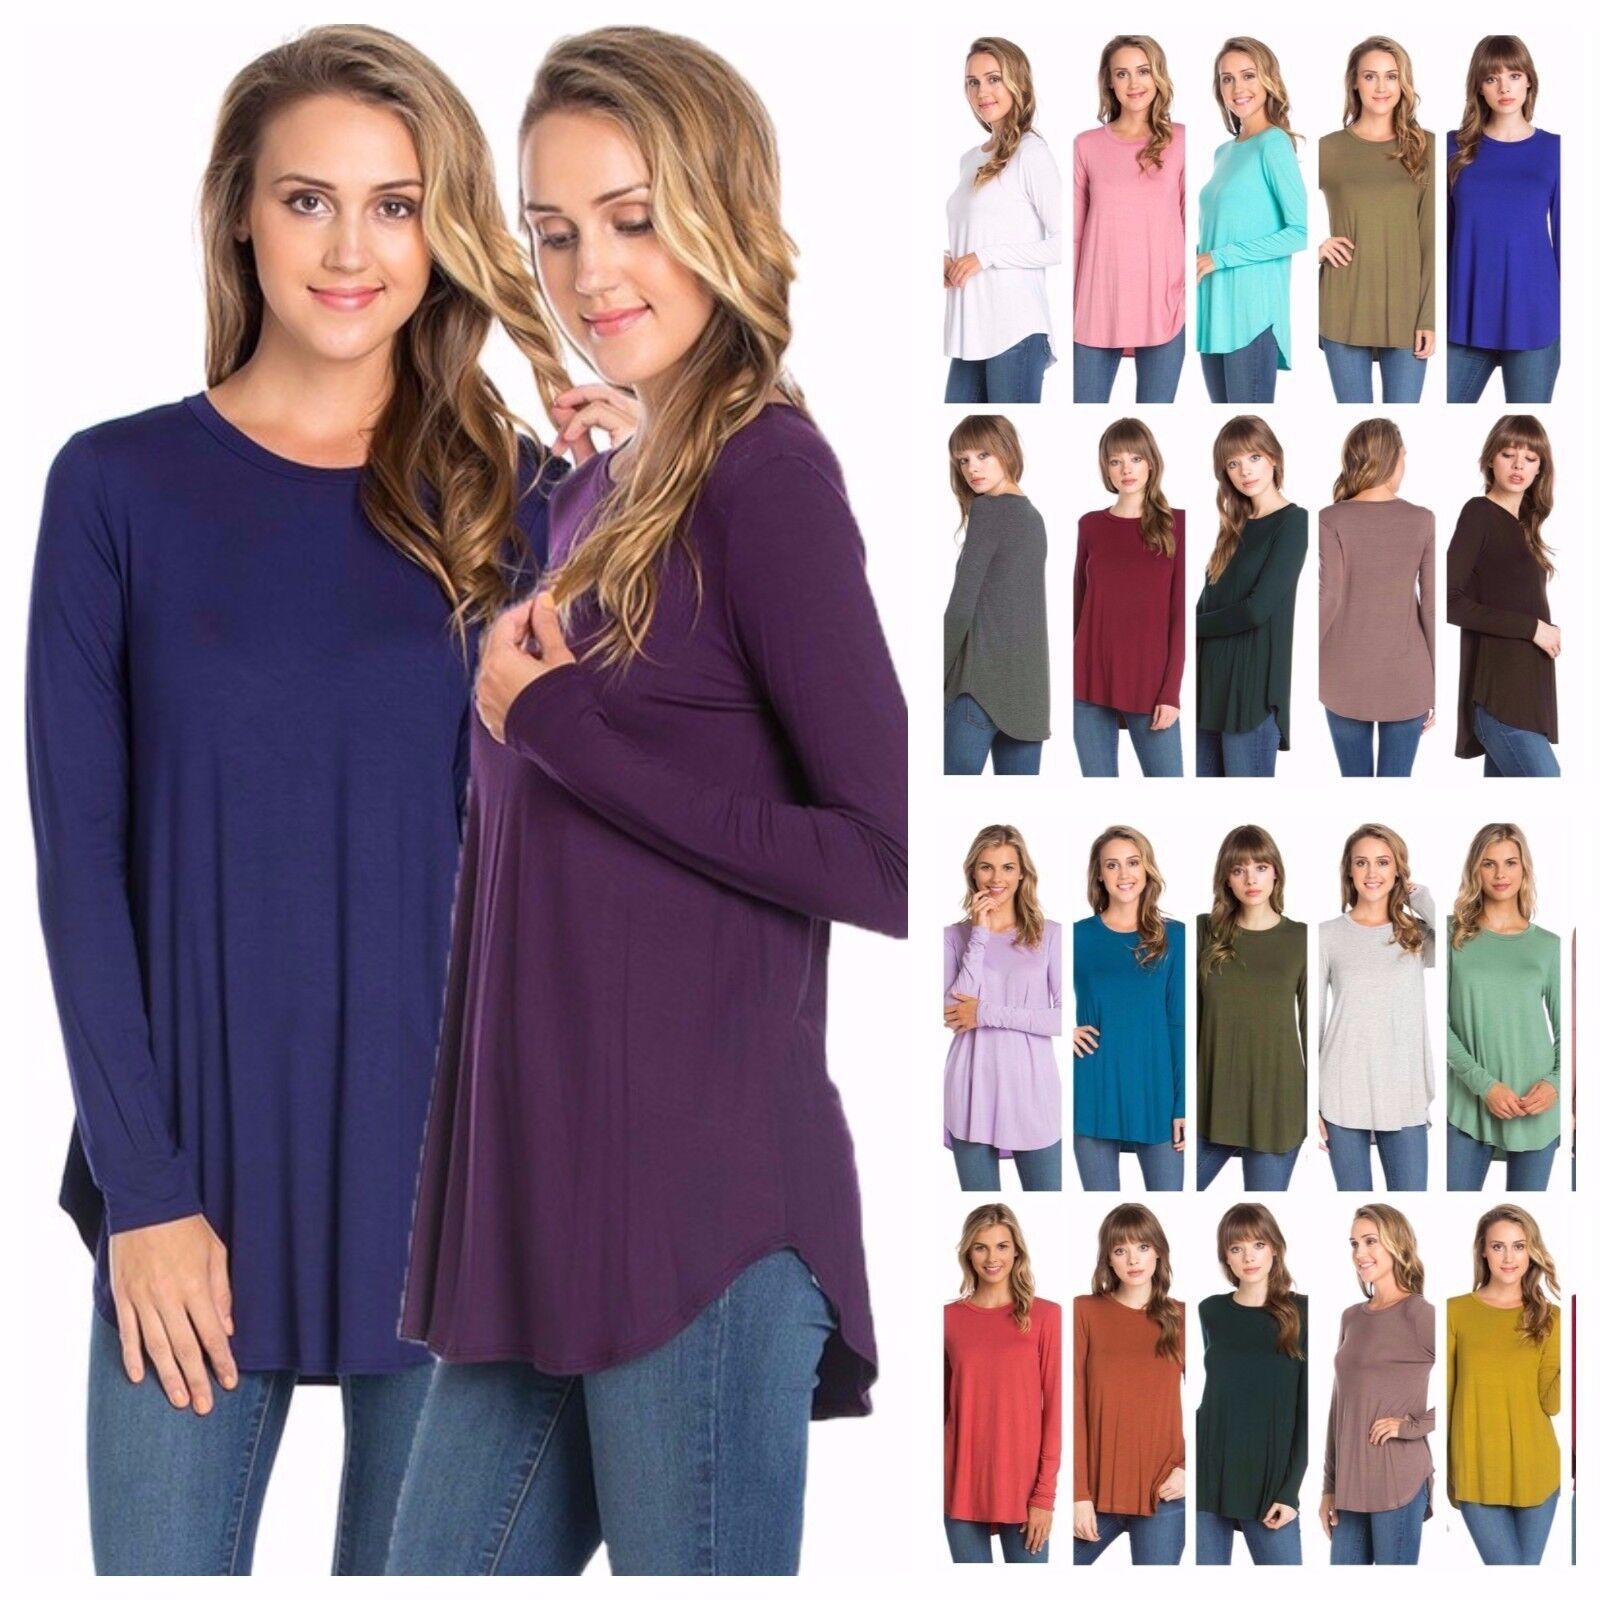 USA Women's Casual Long Sleeve Scallop Hem Tunic Top Dress Scoop Neck T-Shirts